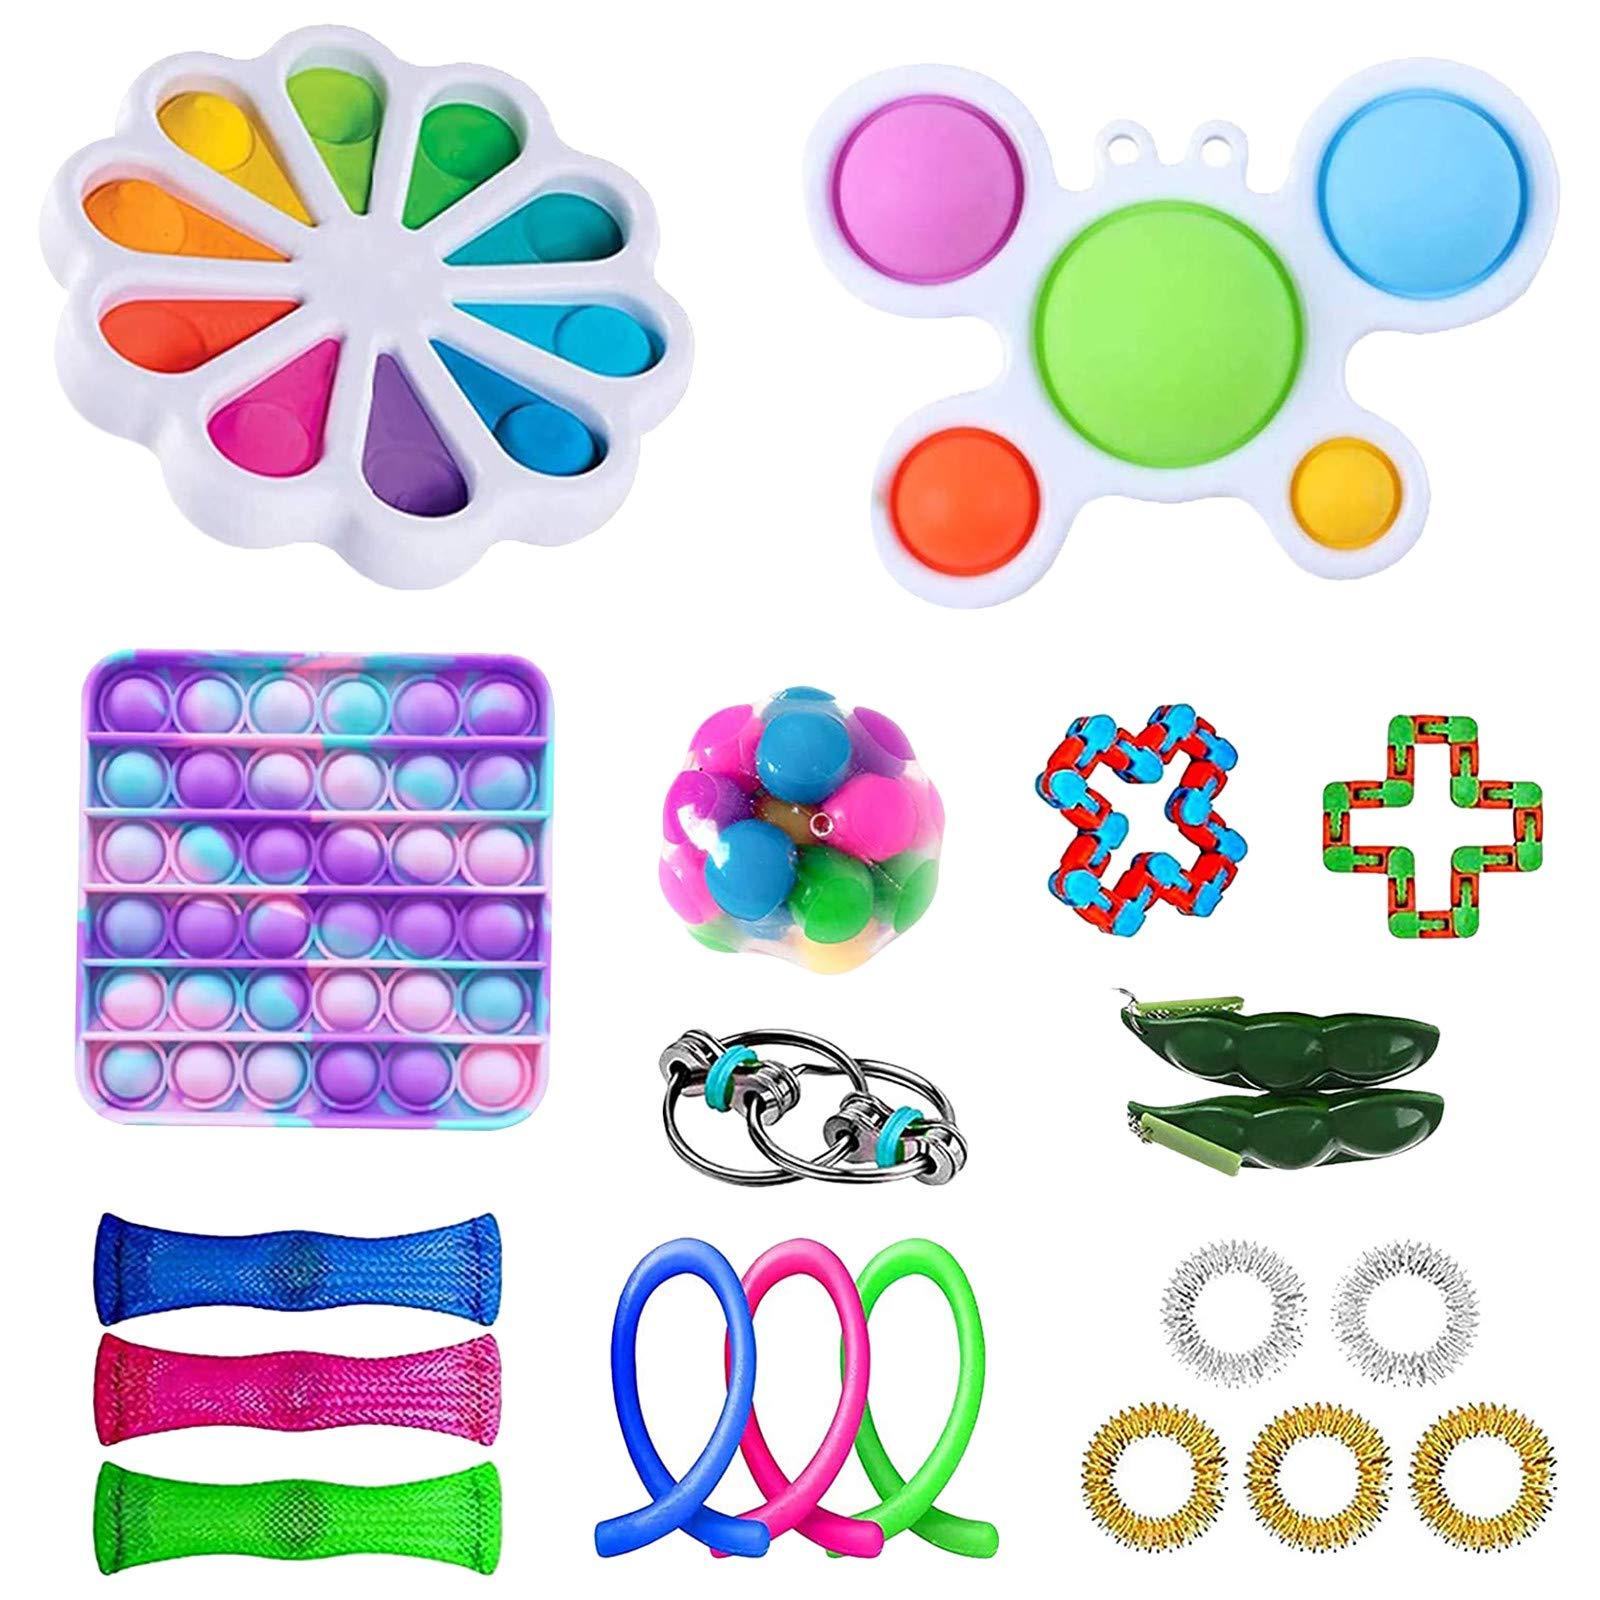 30Pcs TIK Tok Fidget Toys Pack, Fidget Pack Sensory Relieves Stress Anxiety for Kids Adults,Marble Mesh Push Pop Bubble Fidget Sensory Toy,Autism Stress Reliever Stress Reliever Toy (Toy Sey A2)